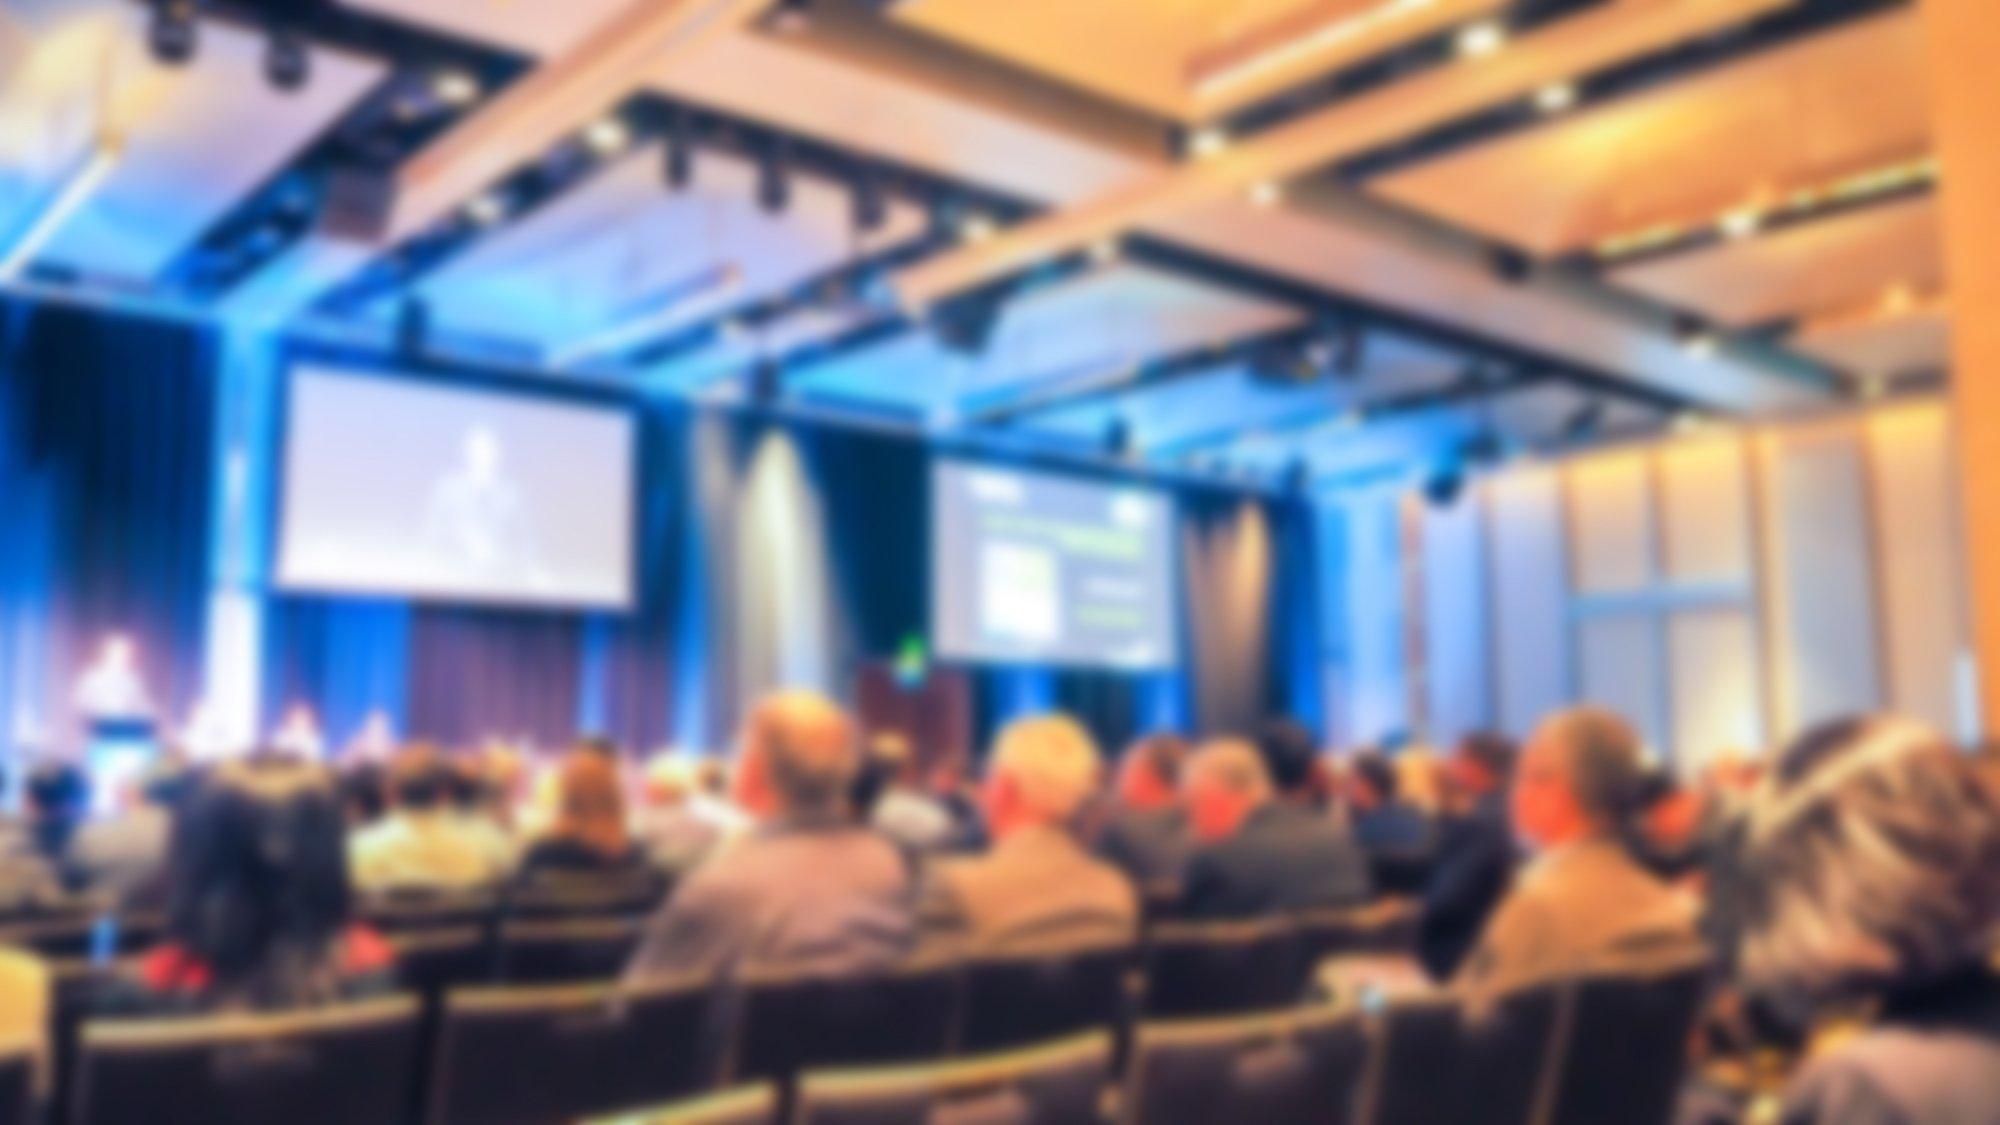 buffett-2019-agm-berkshire-conference-meeting